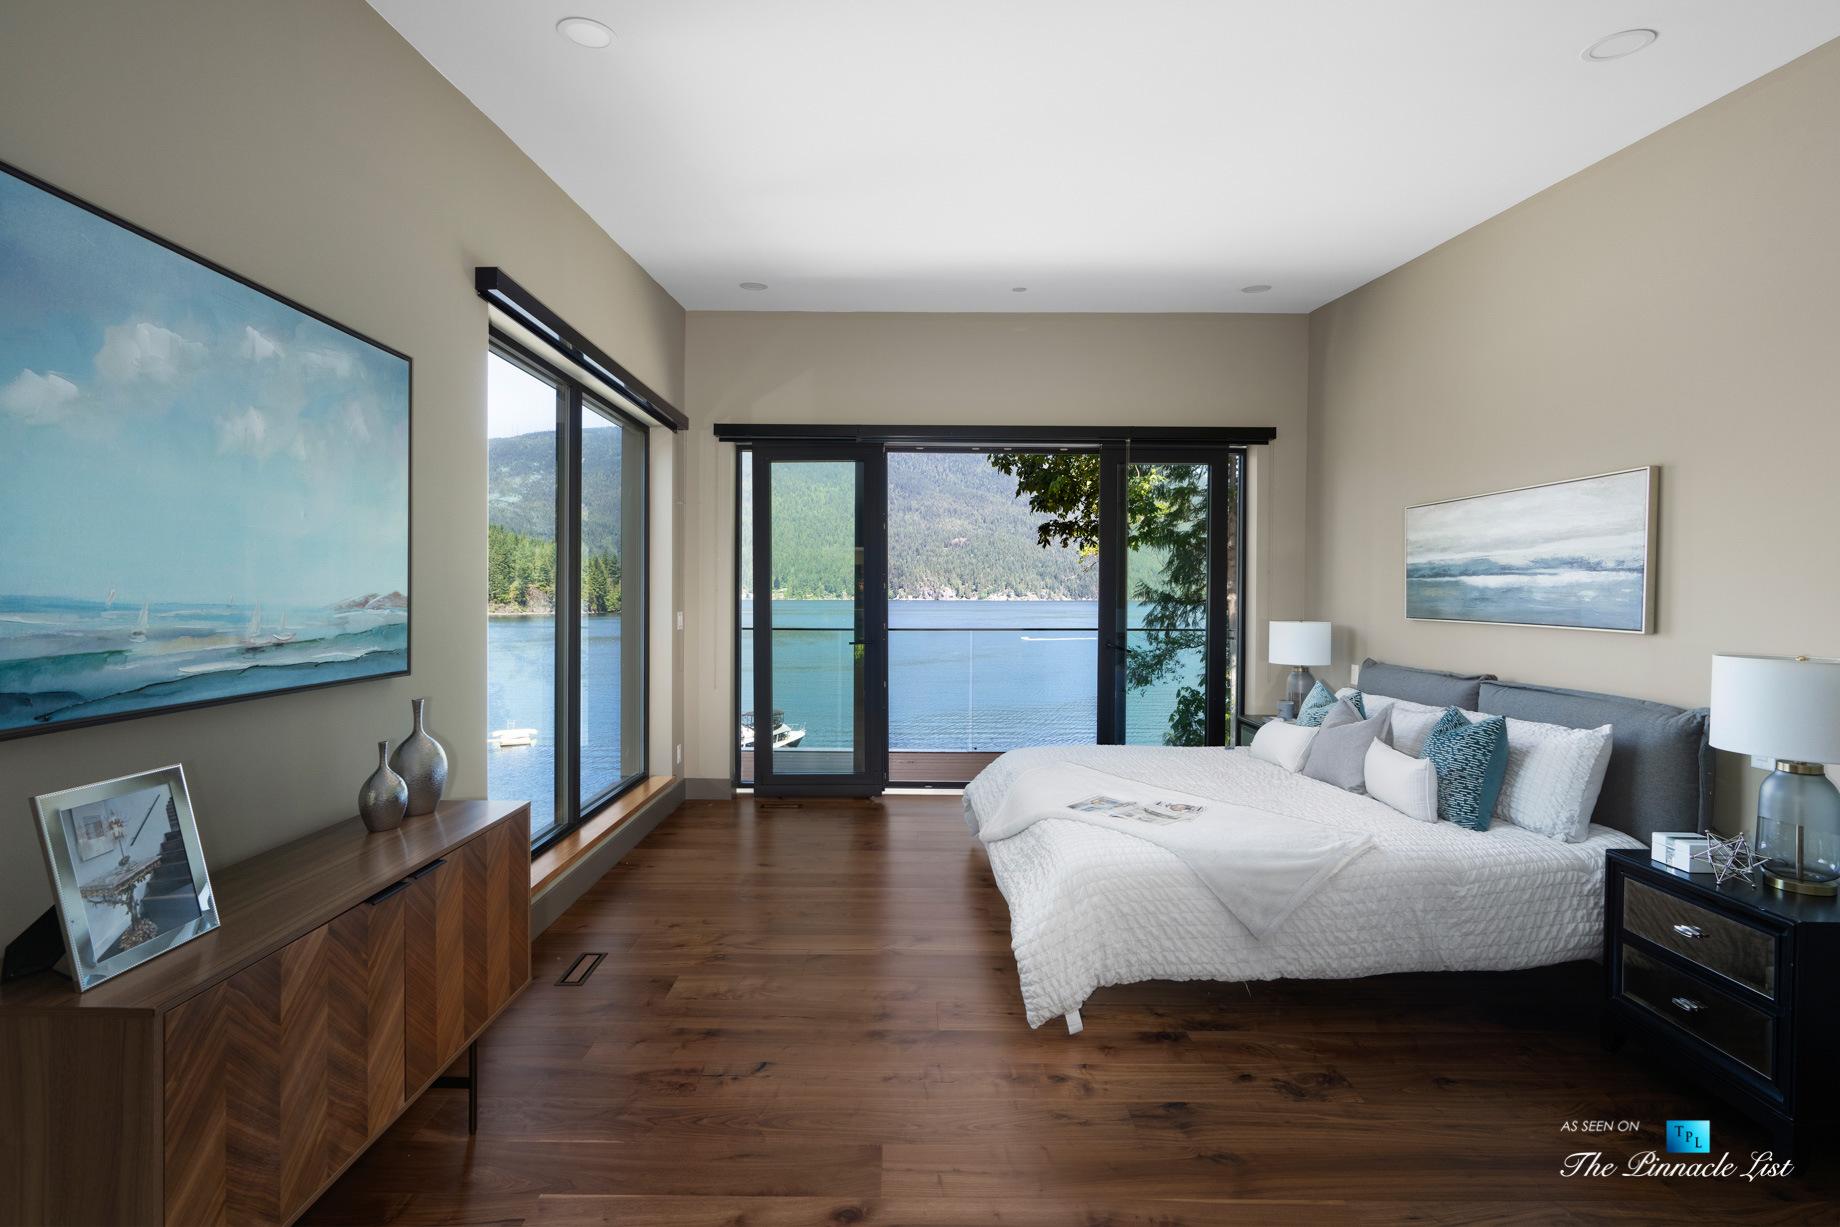 3350 Watson Rd, Belcarra, BC, Canada – Vancouver Luxury Real Estate – Oceanview Master Bedroom